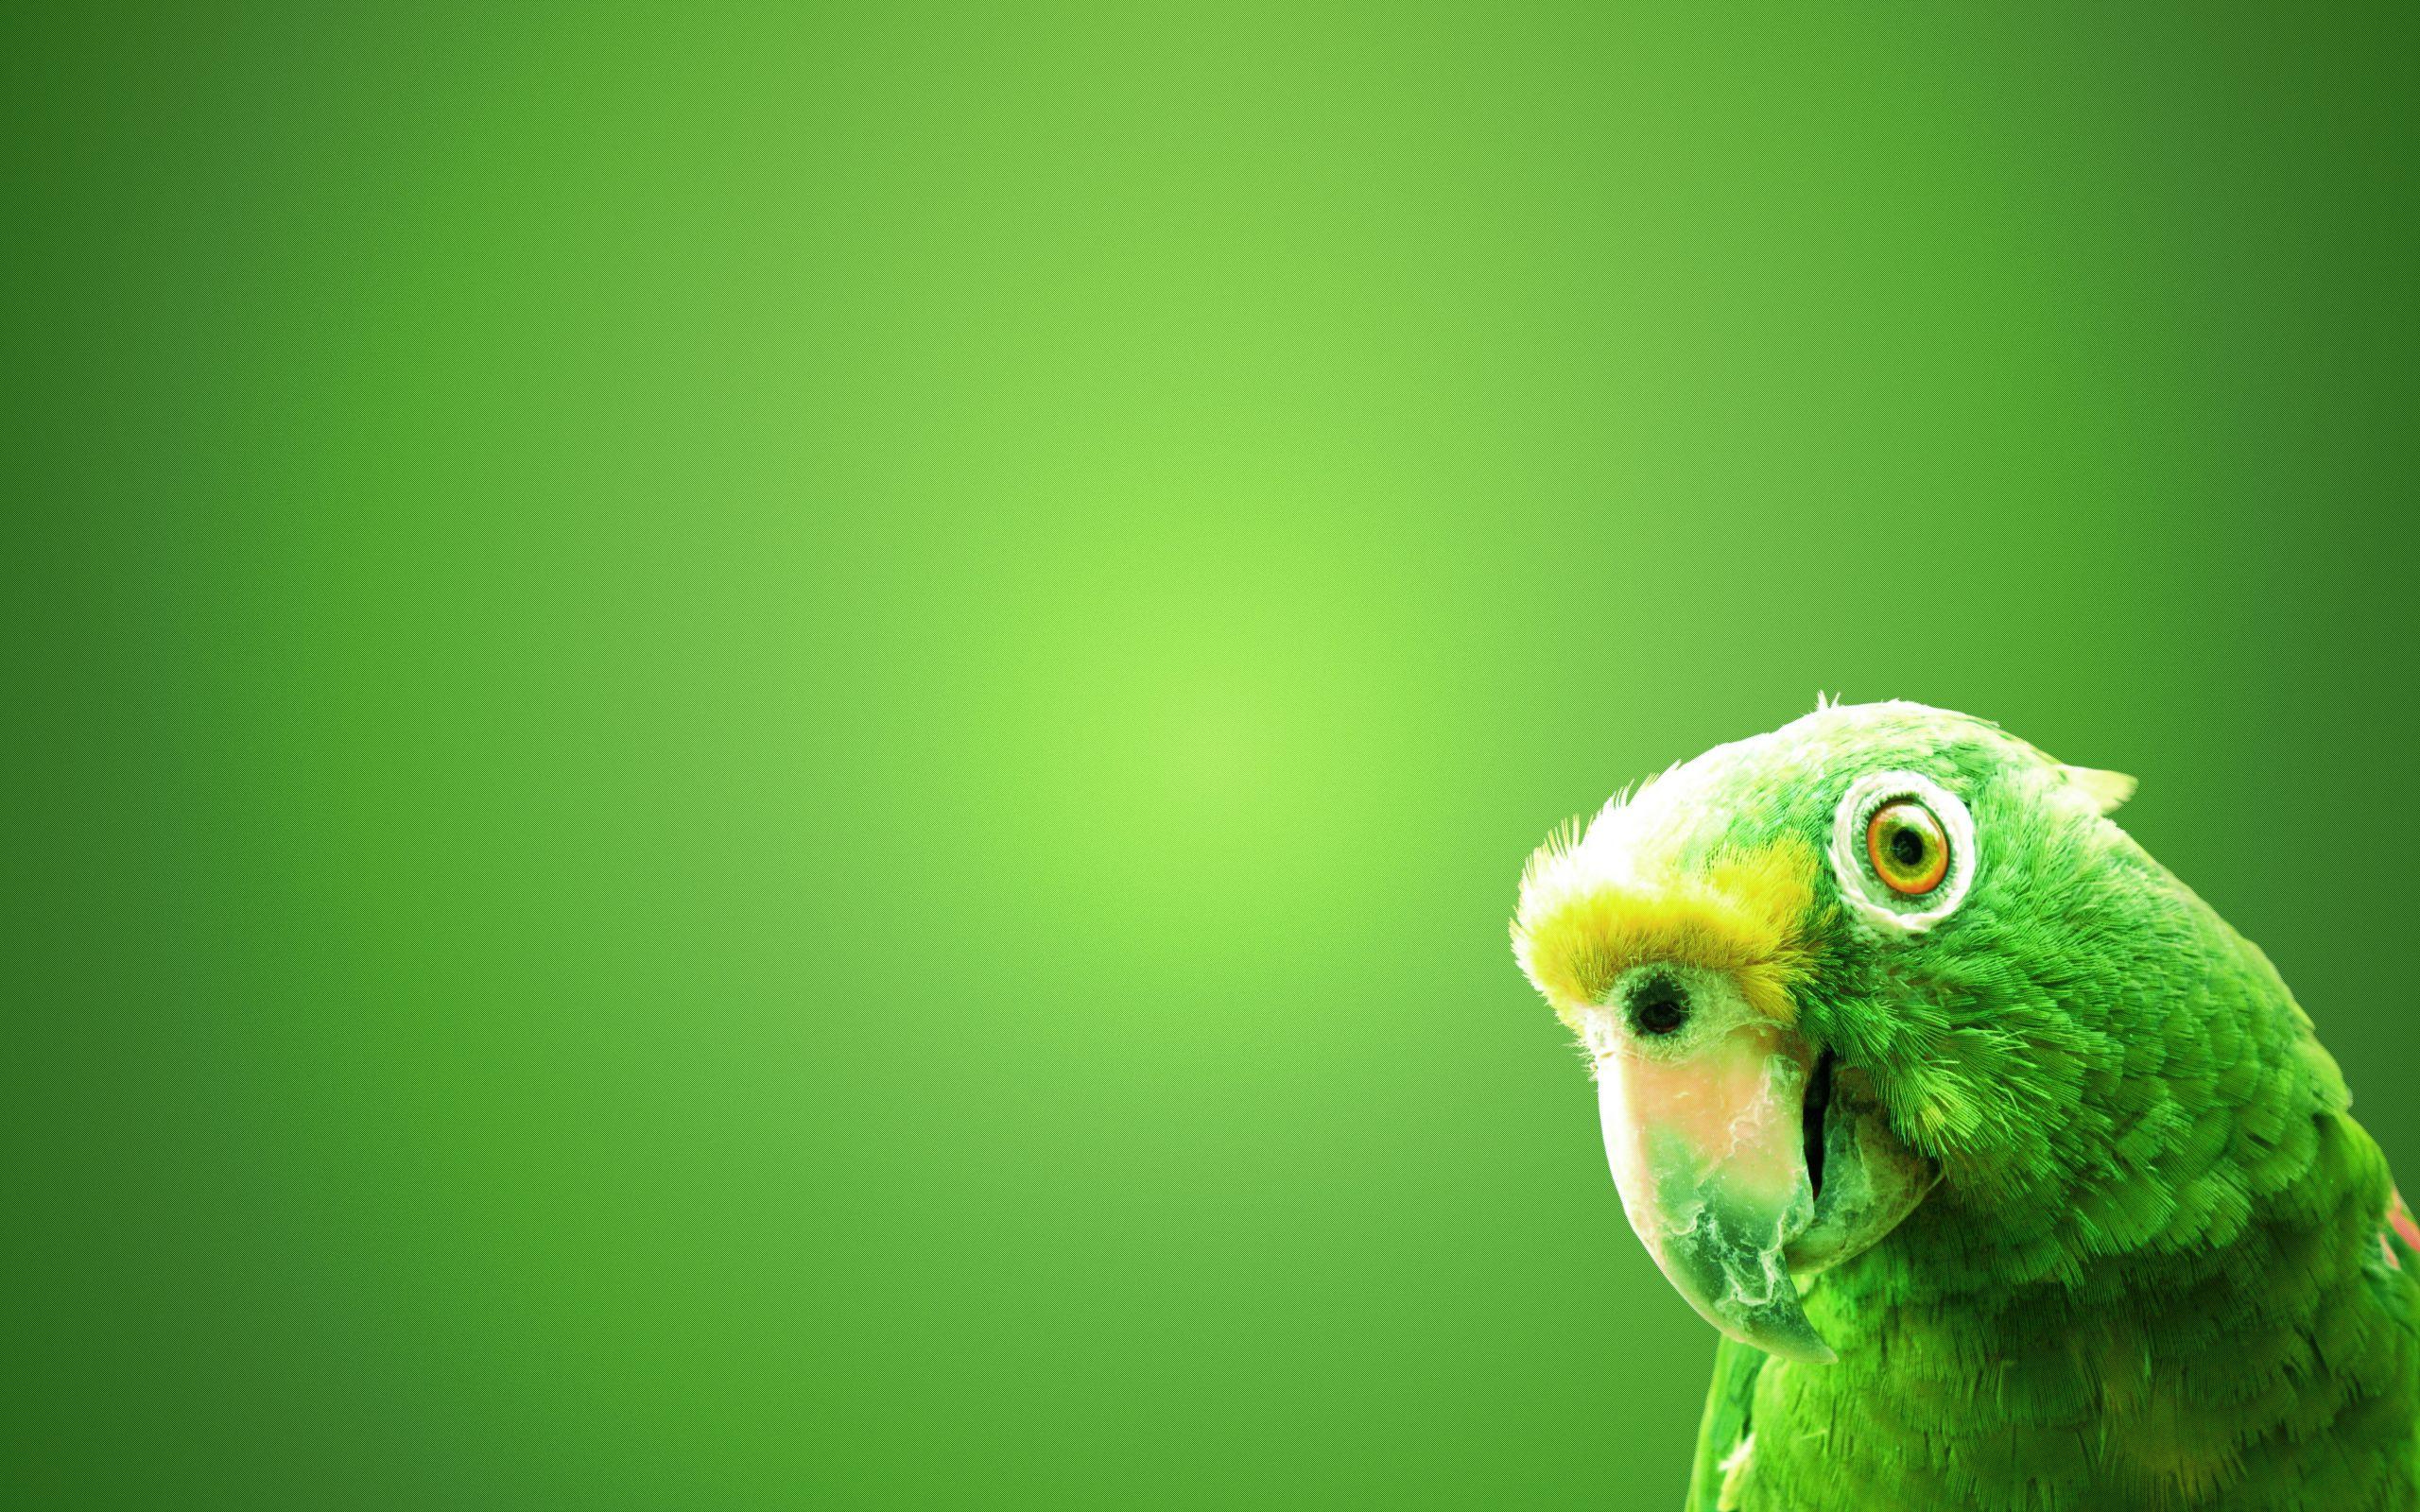 Green Screen Wallpaper – An Image Productizer's Best Friend